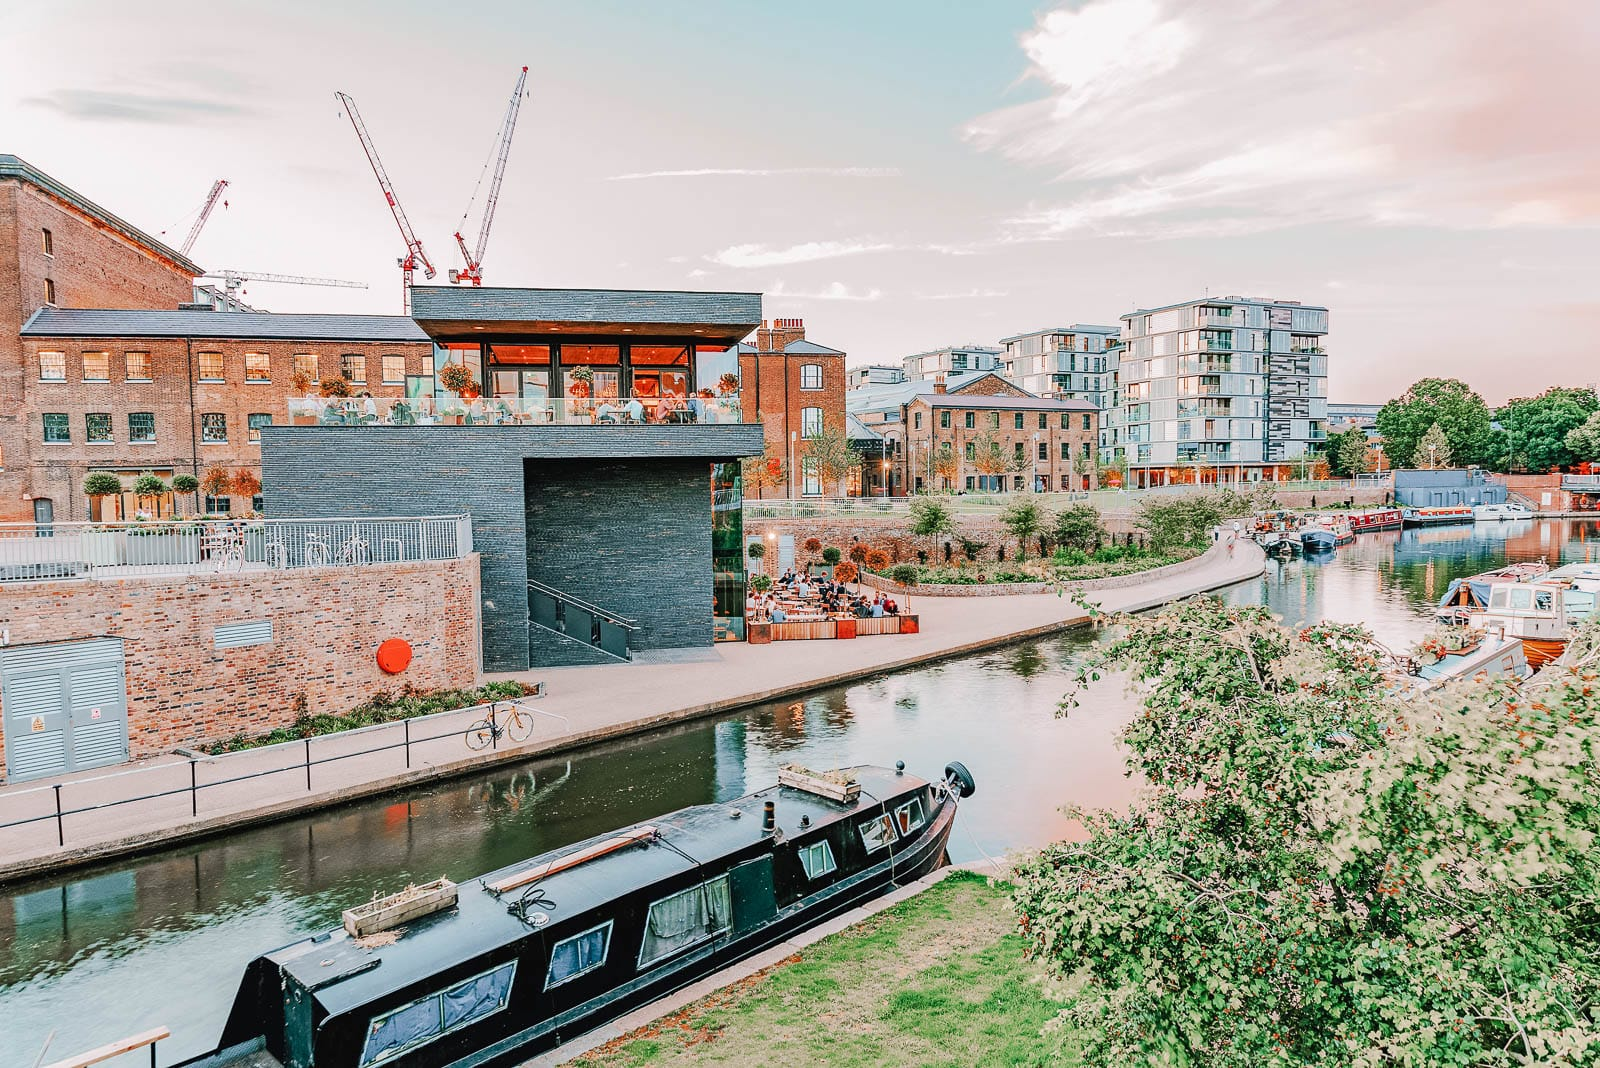 10 Best Things To Do In Kings Cross - London (4)